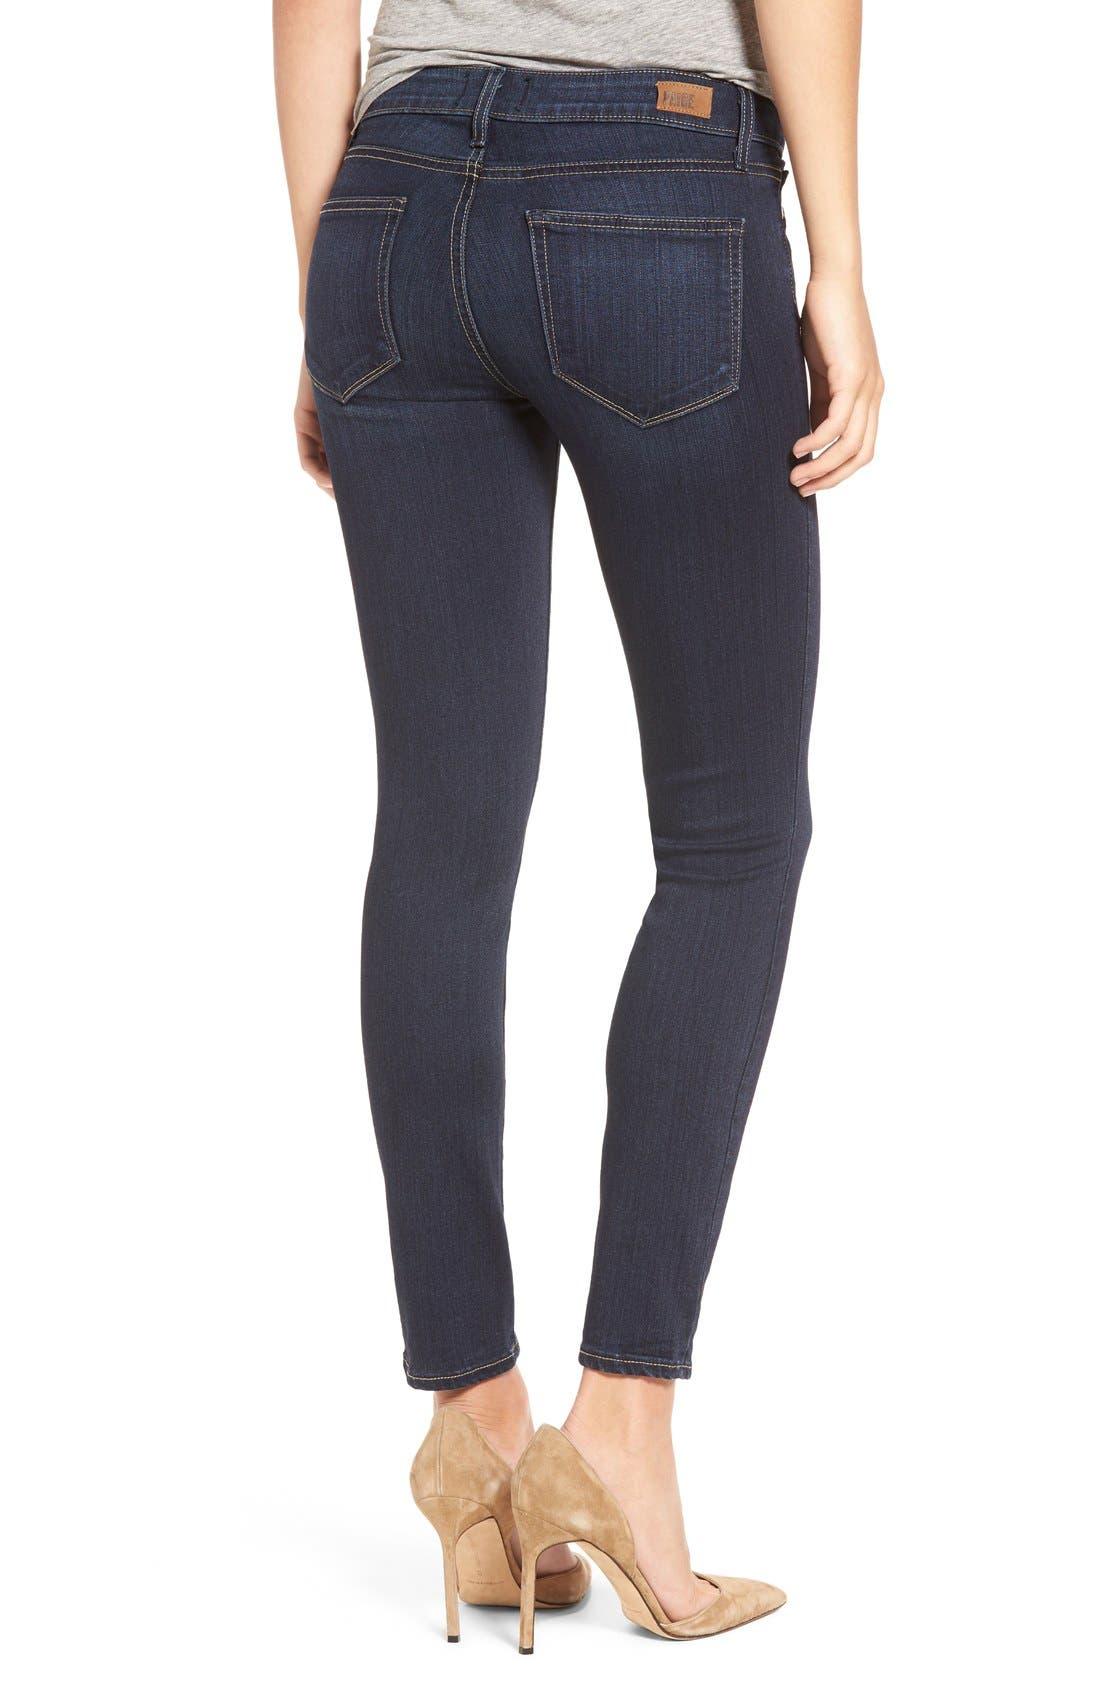 Transcend - Verdugo Ankle Ultra Skinny Jeans,                             Alternate thumbnail 3, color,                             Hartmann